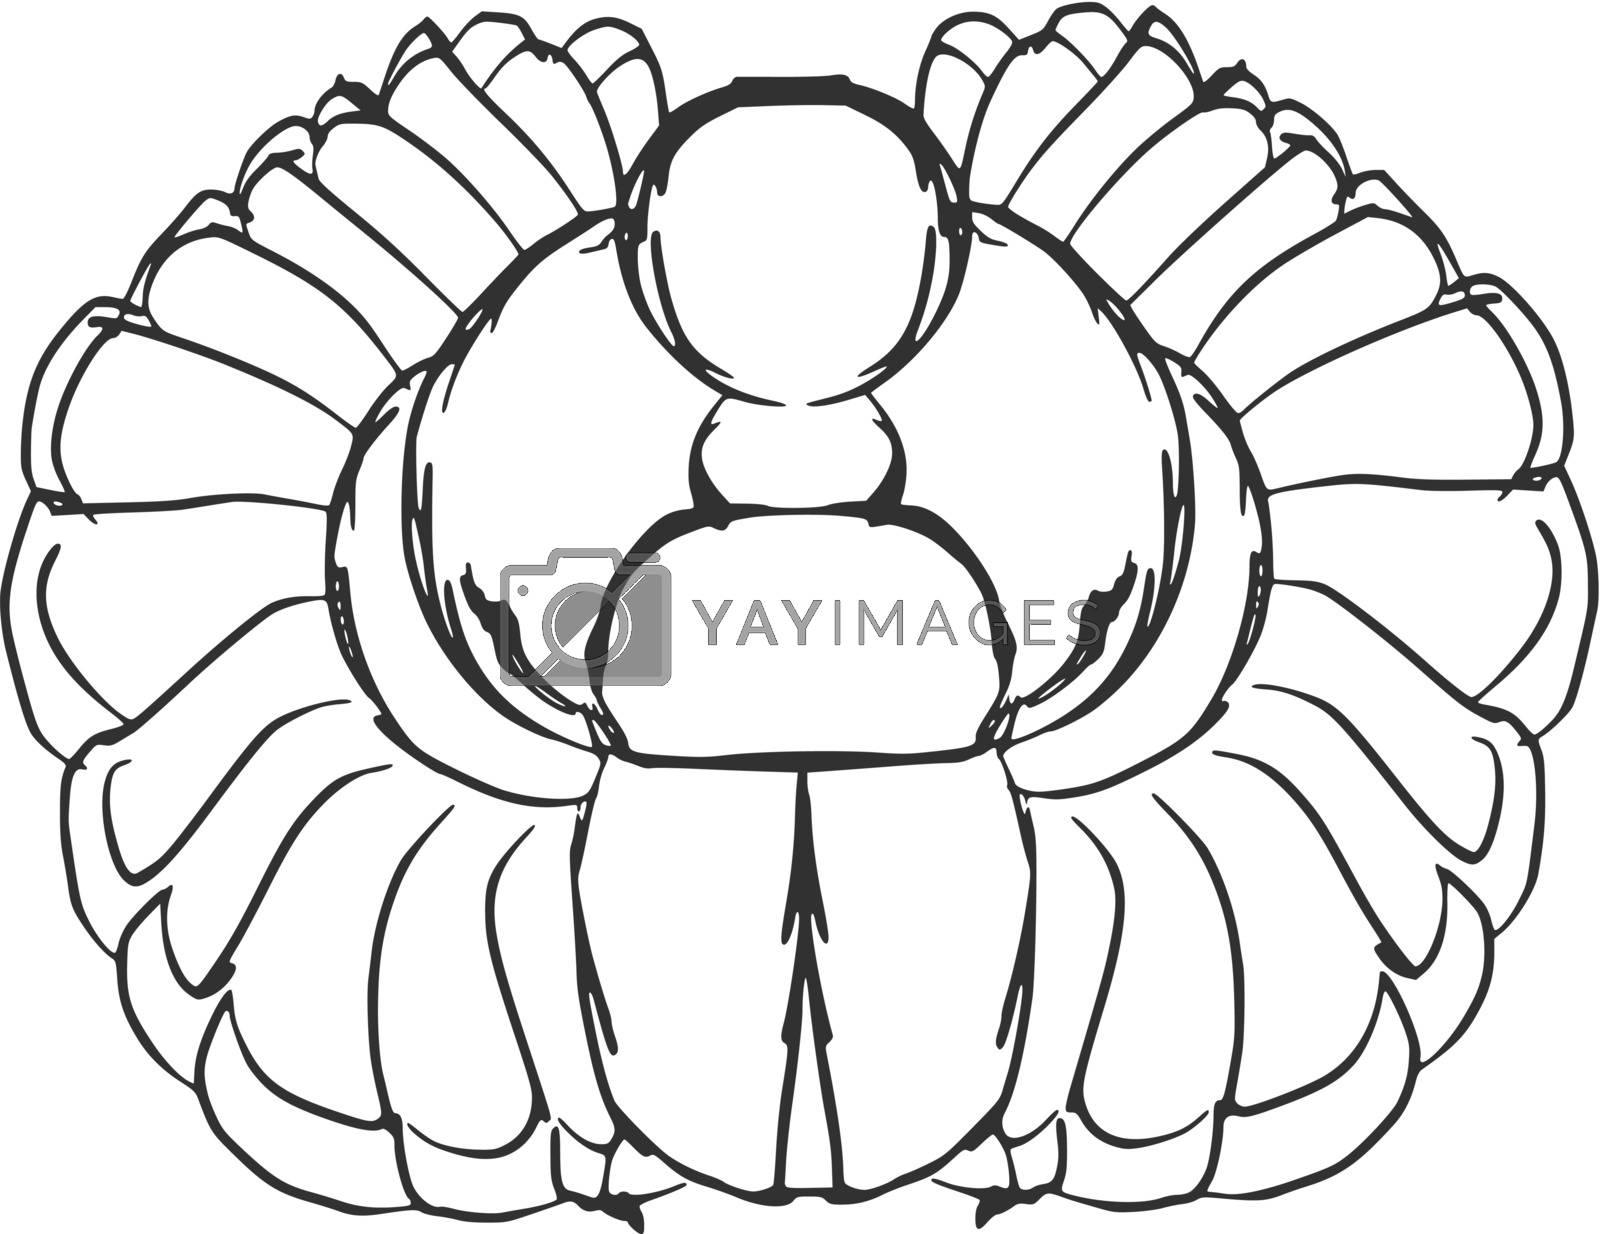 hand drawn, sketch illustration of scarab beetle